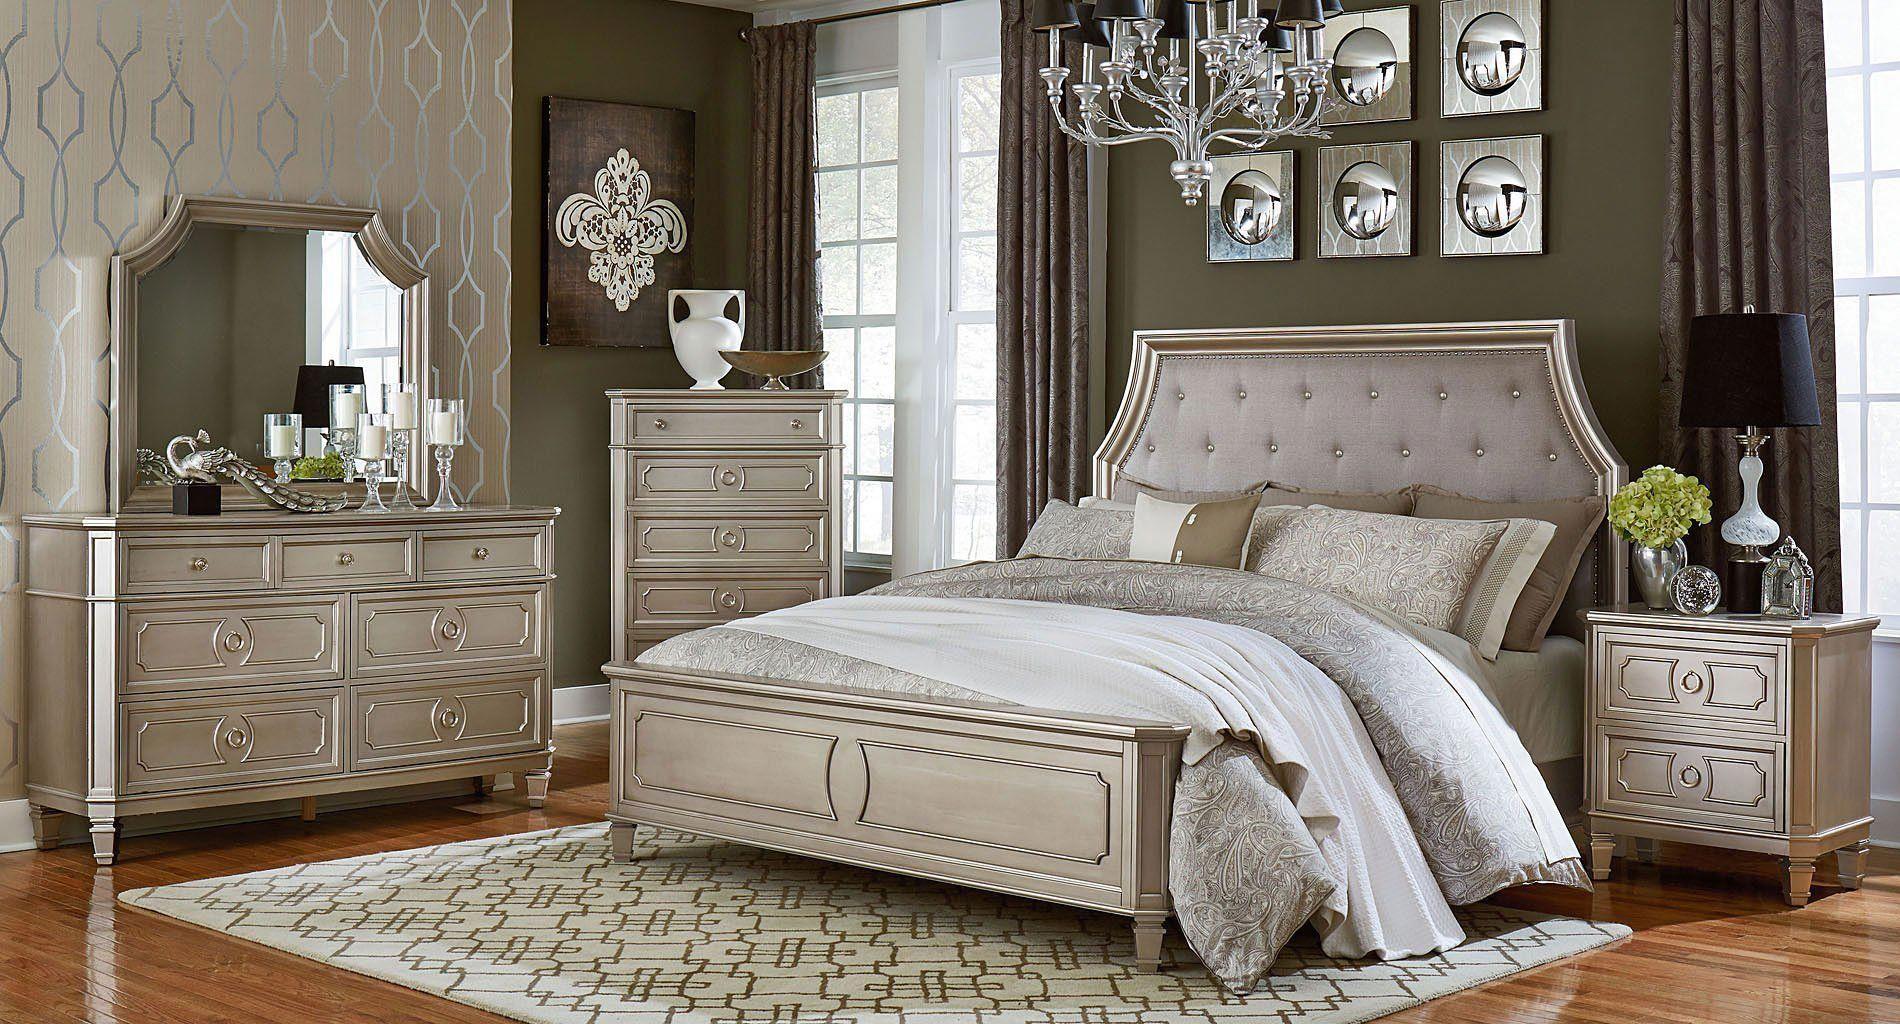 Bedroom Vanity Furniture Bedroom Furniture Furniture